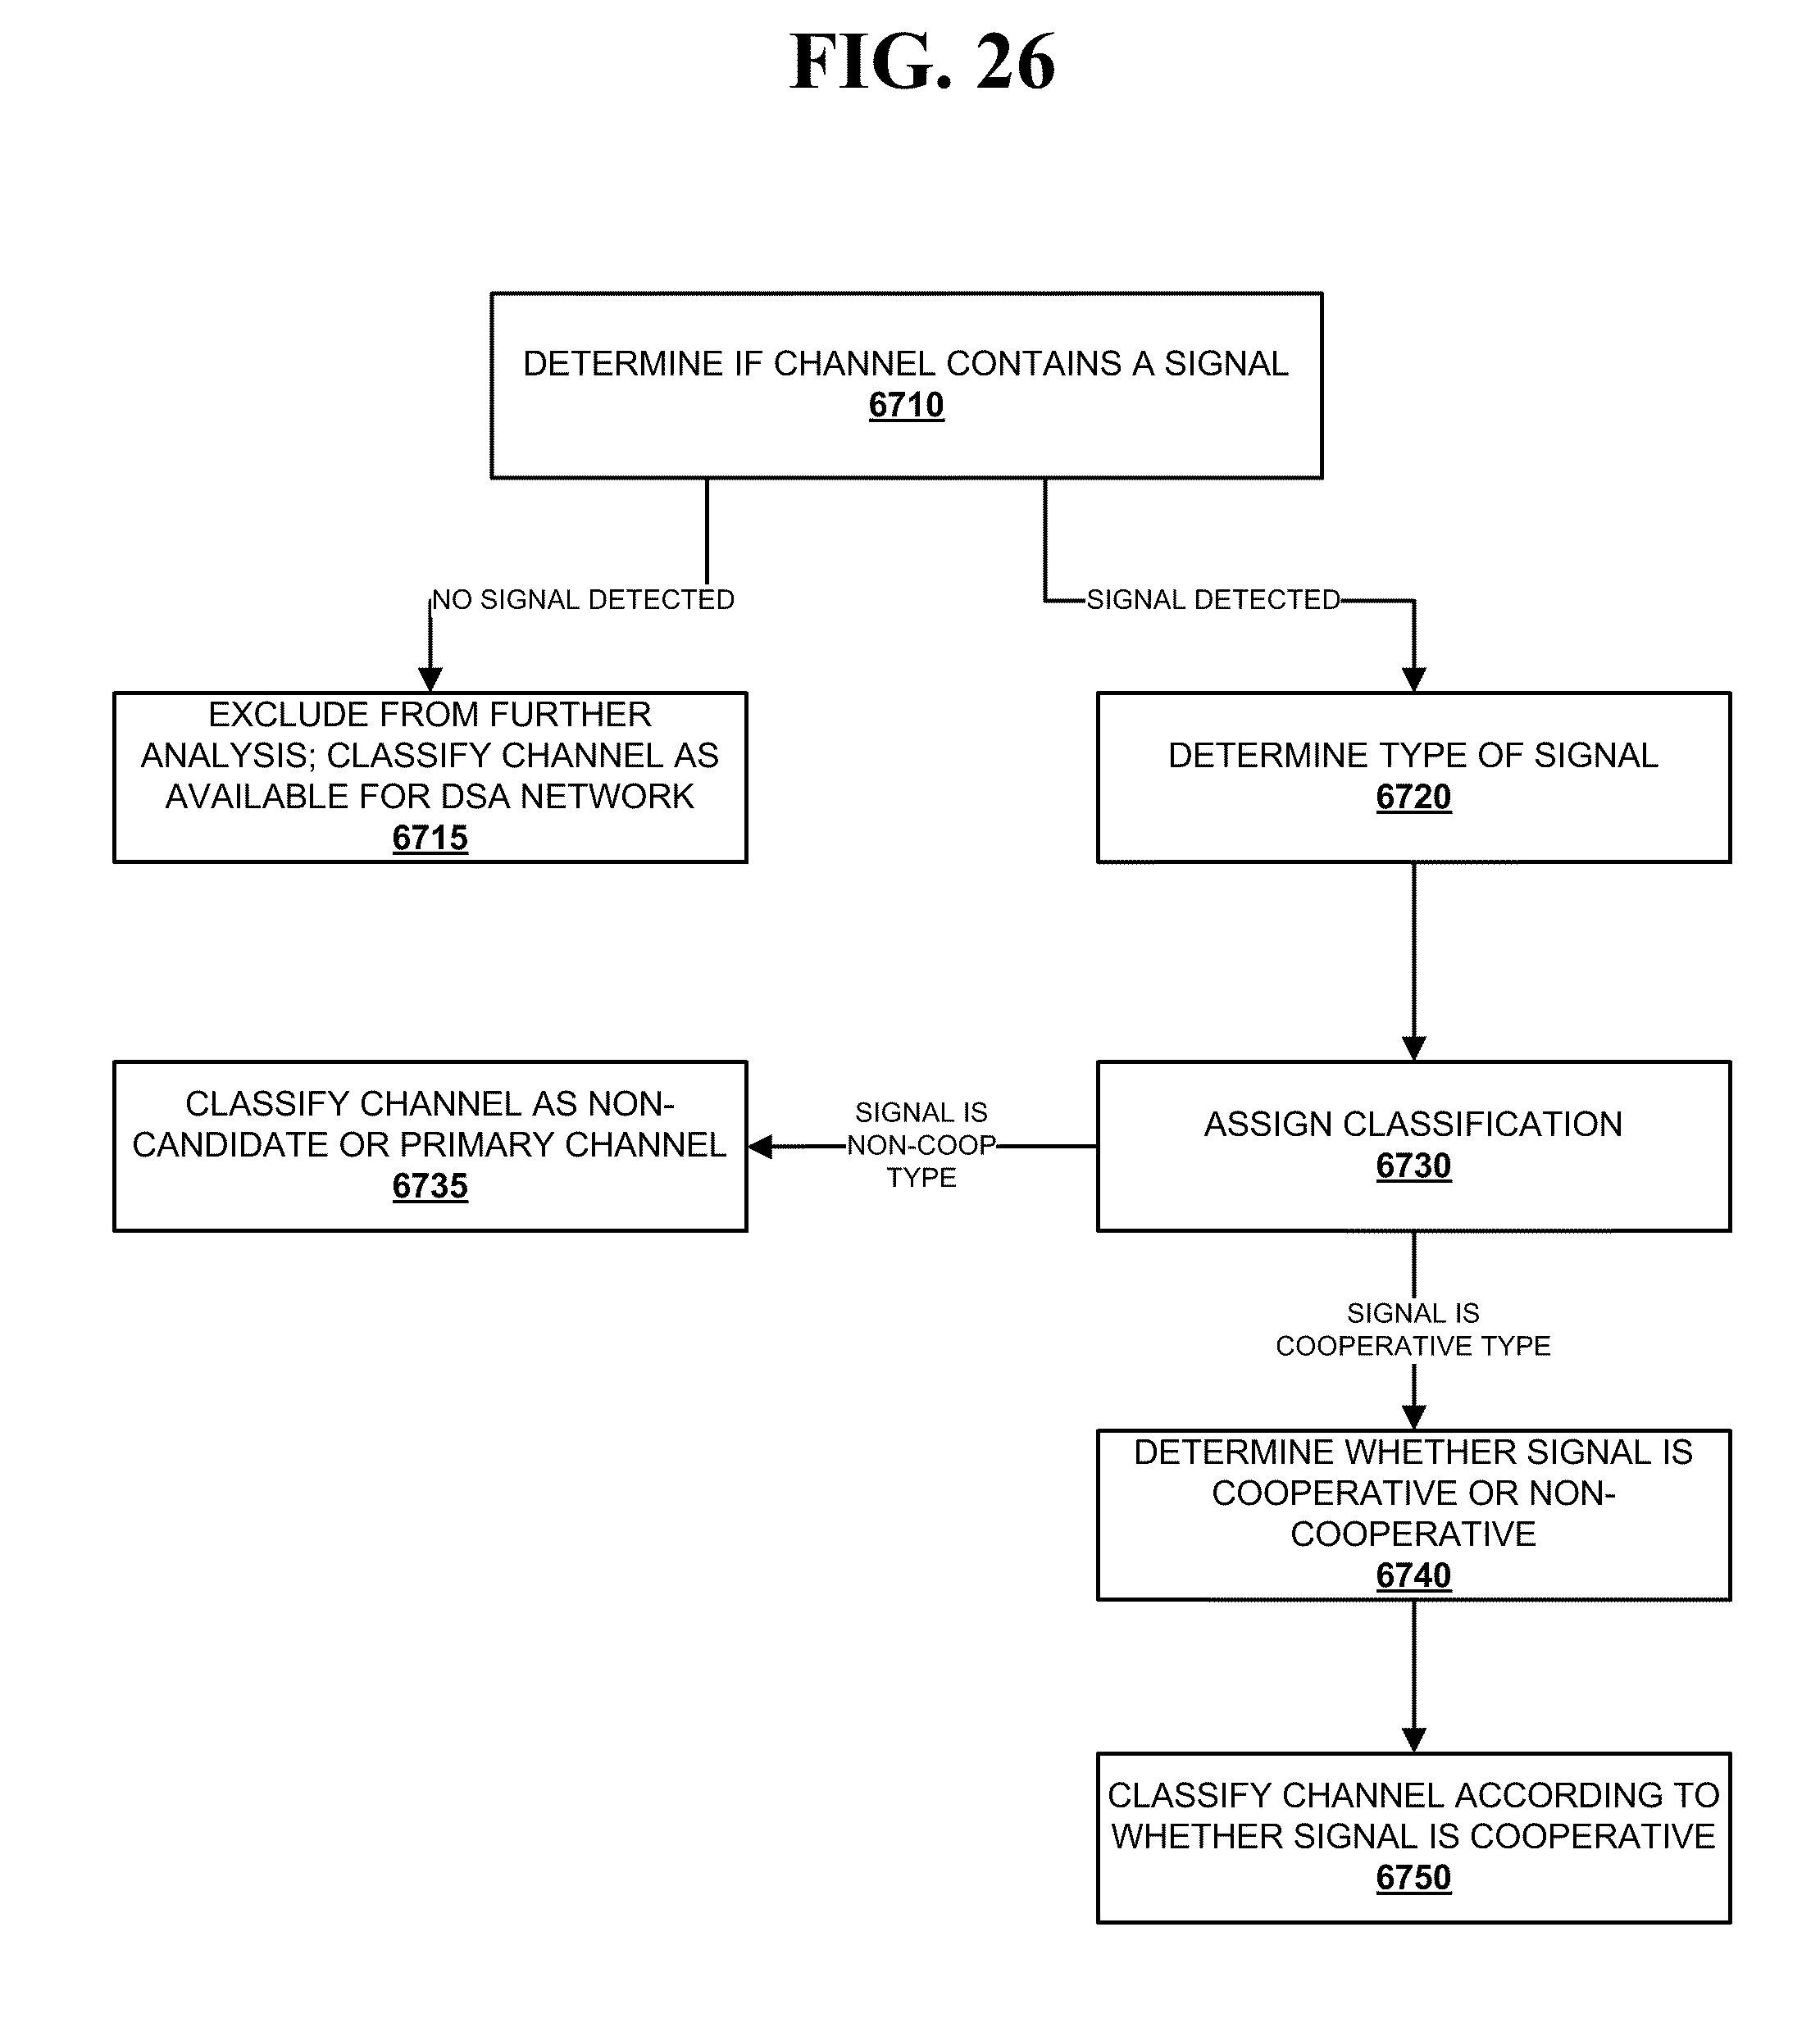 Patent US 8,155,649 B2